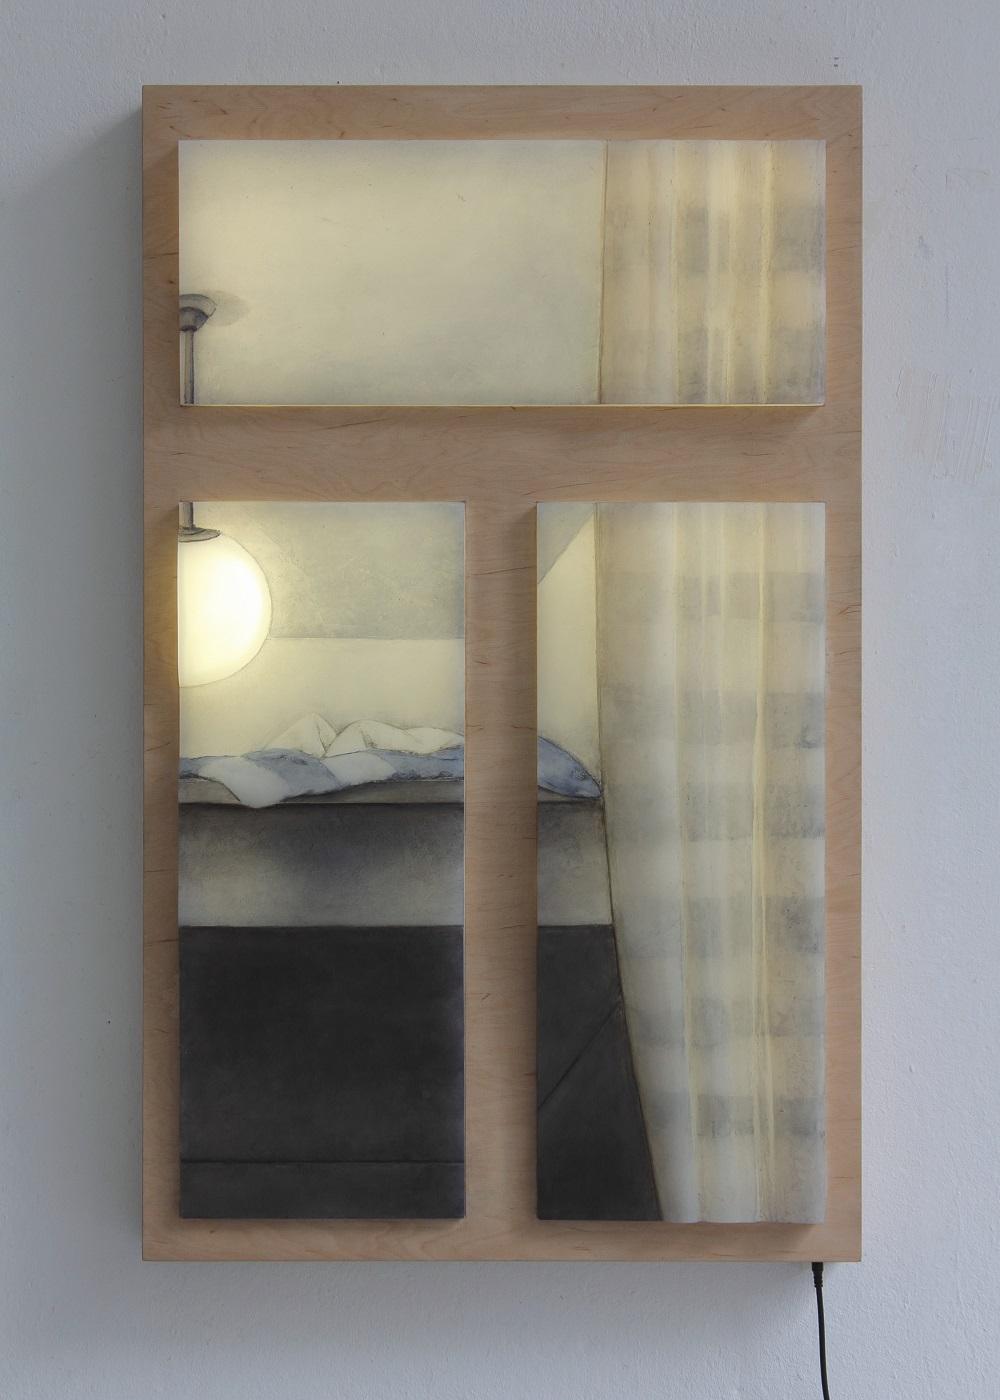 painting, light, object art, contemporary art, window